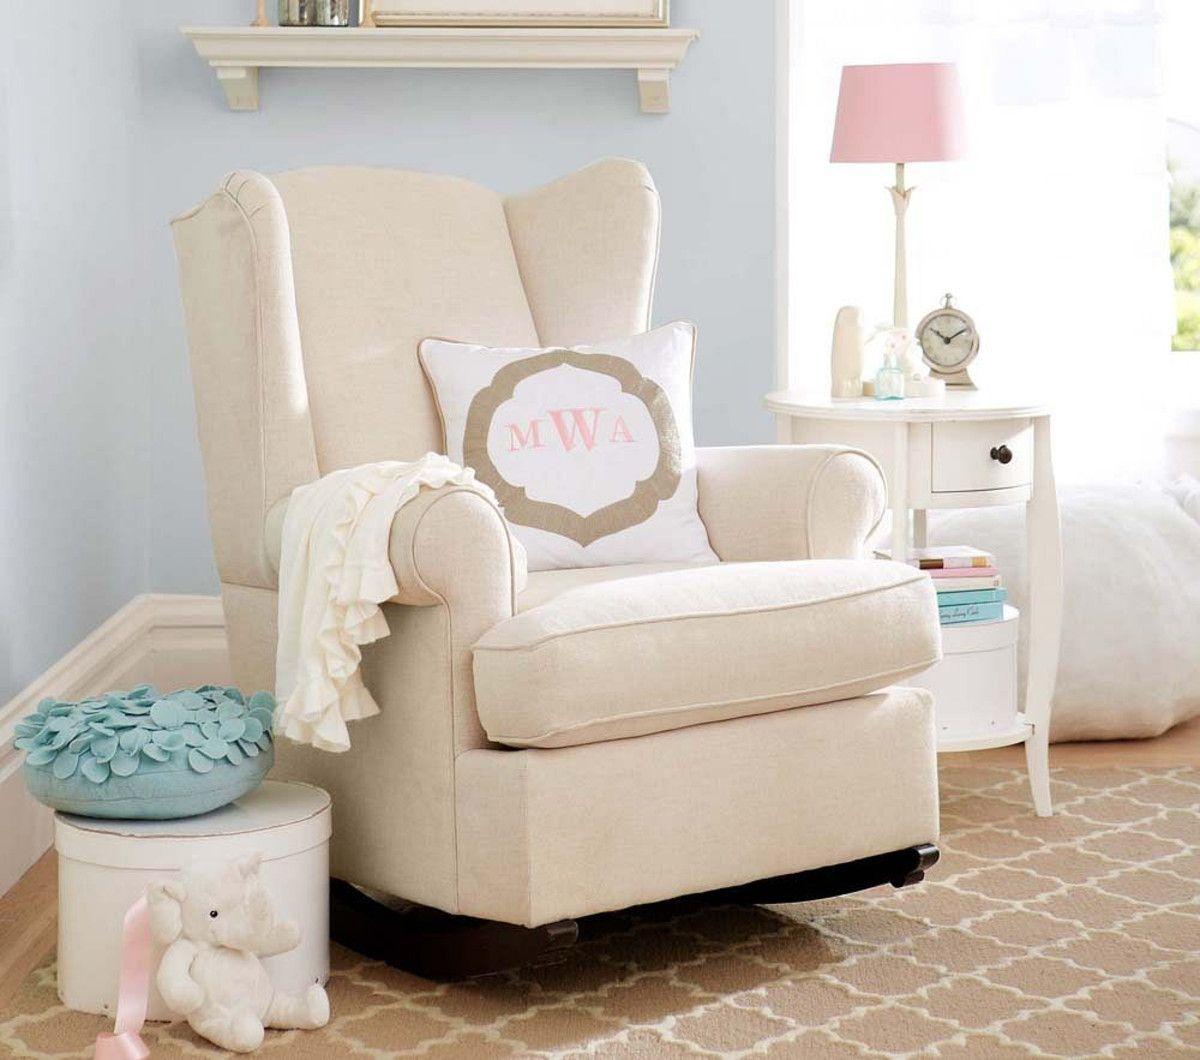 Rocking chair style Wingback Convertible Rocker – Chair Nursery